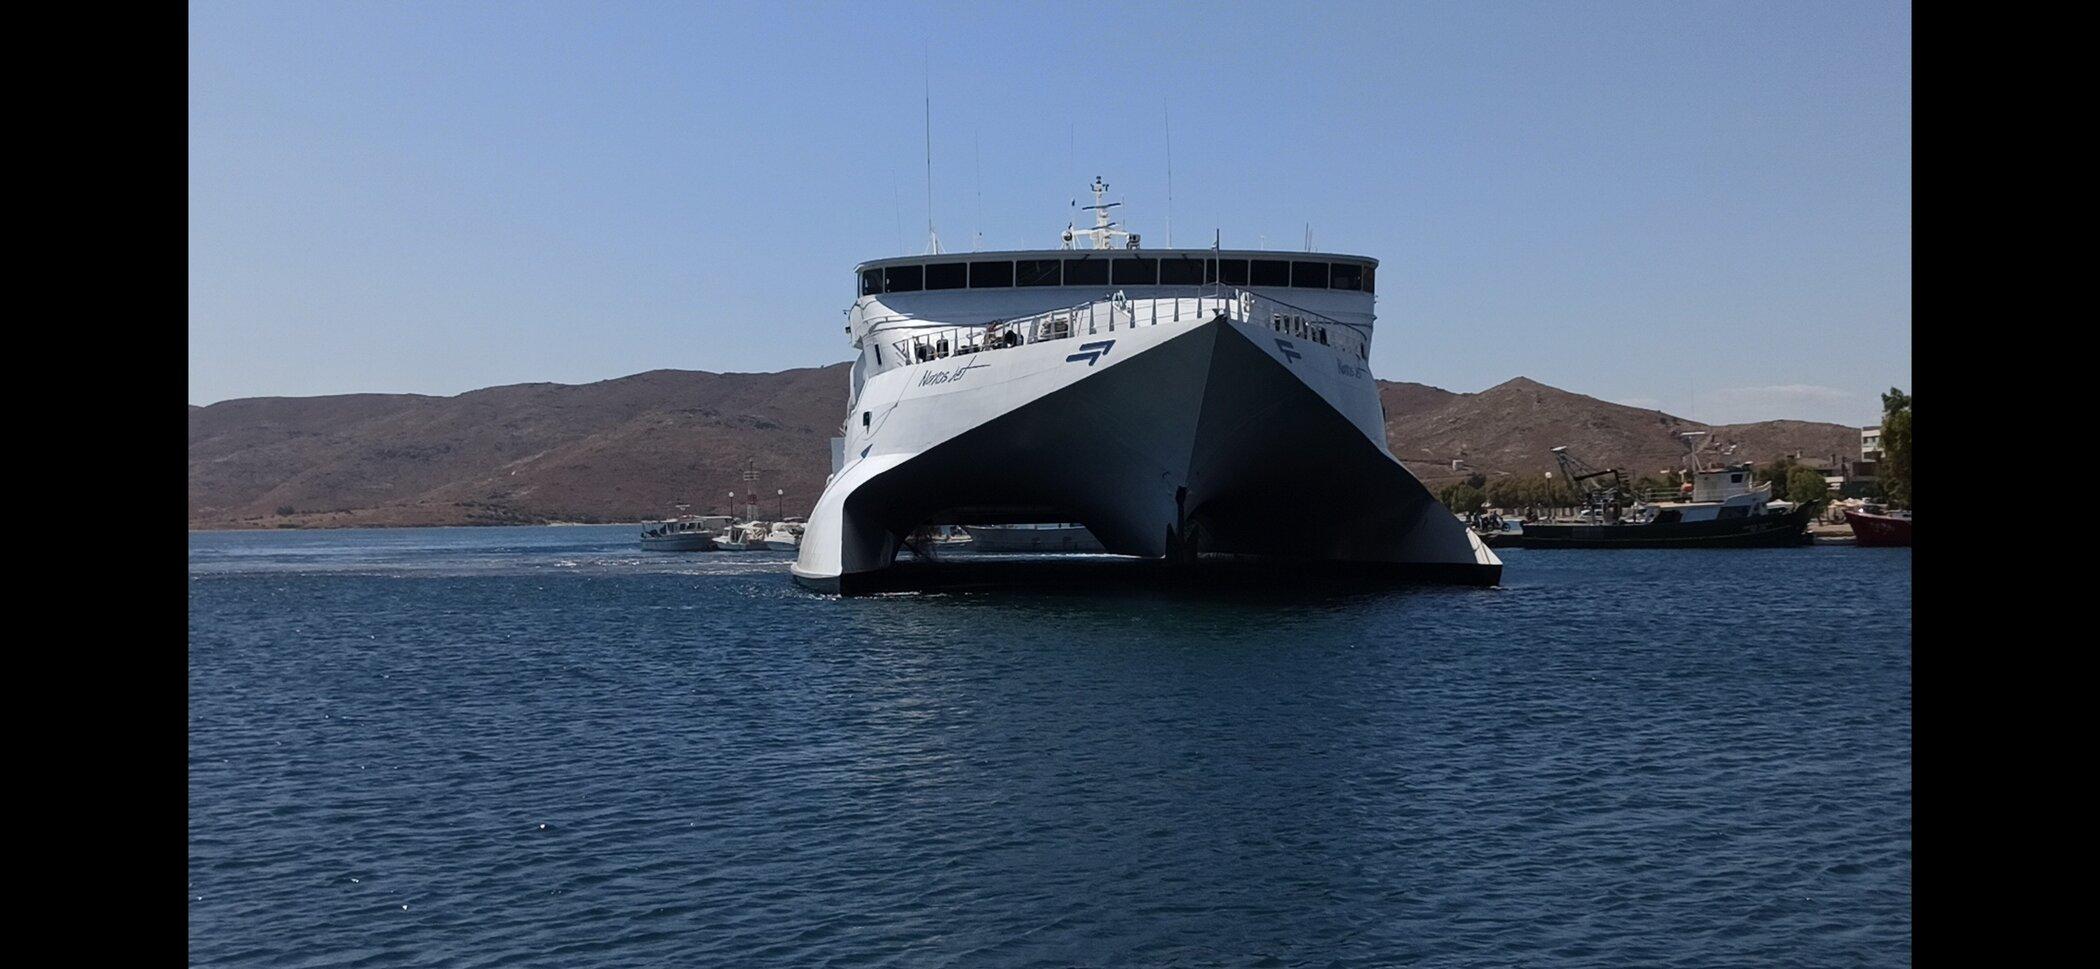 Naxos Jet maneuvering in the port of Karystos